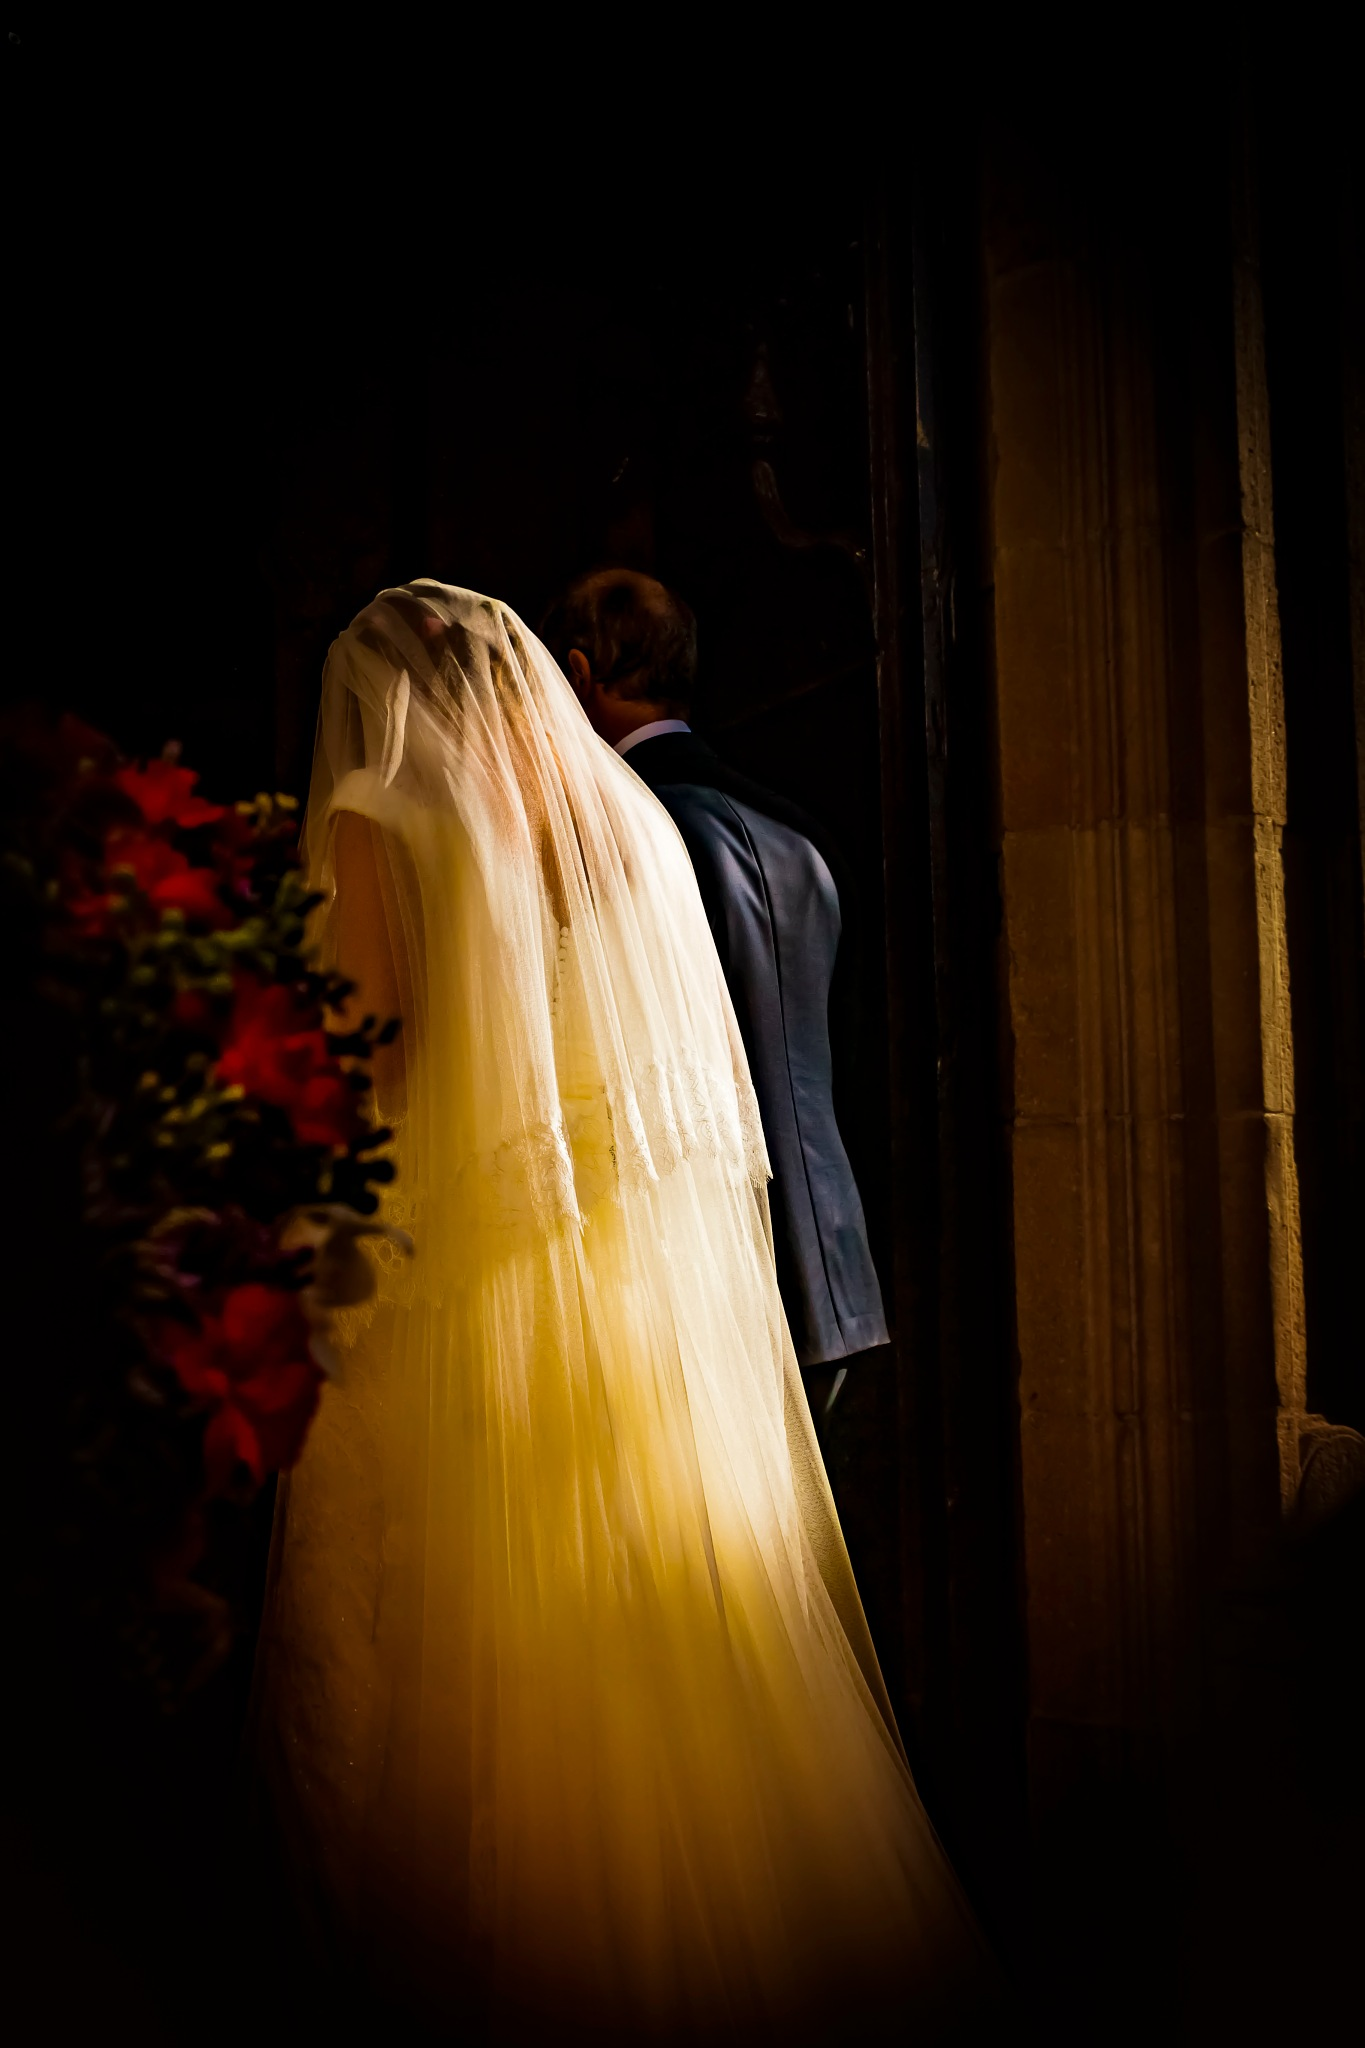 Here comes the bride by djaffar adane